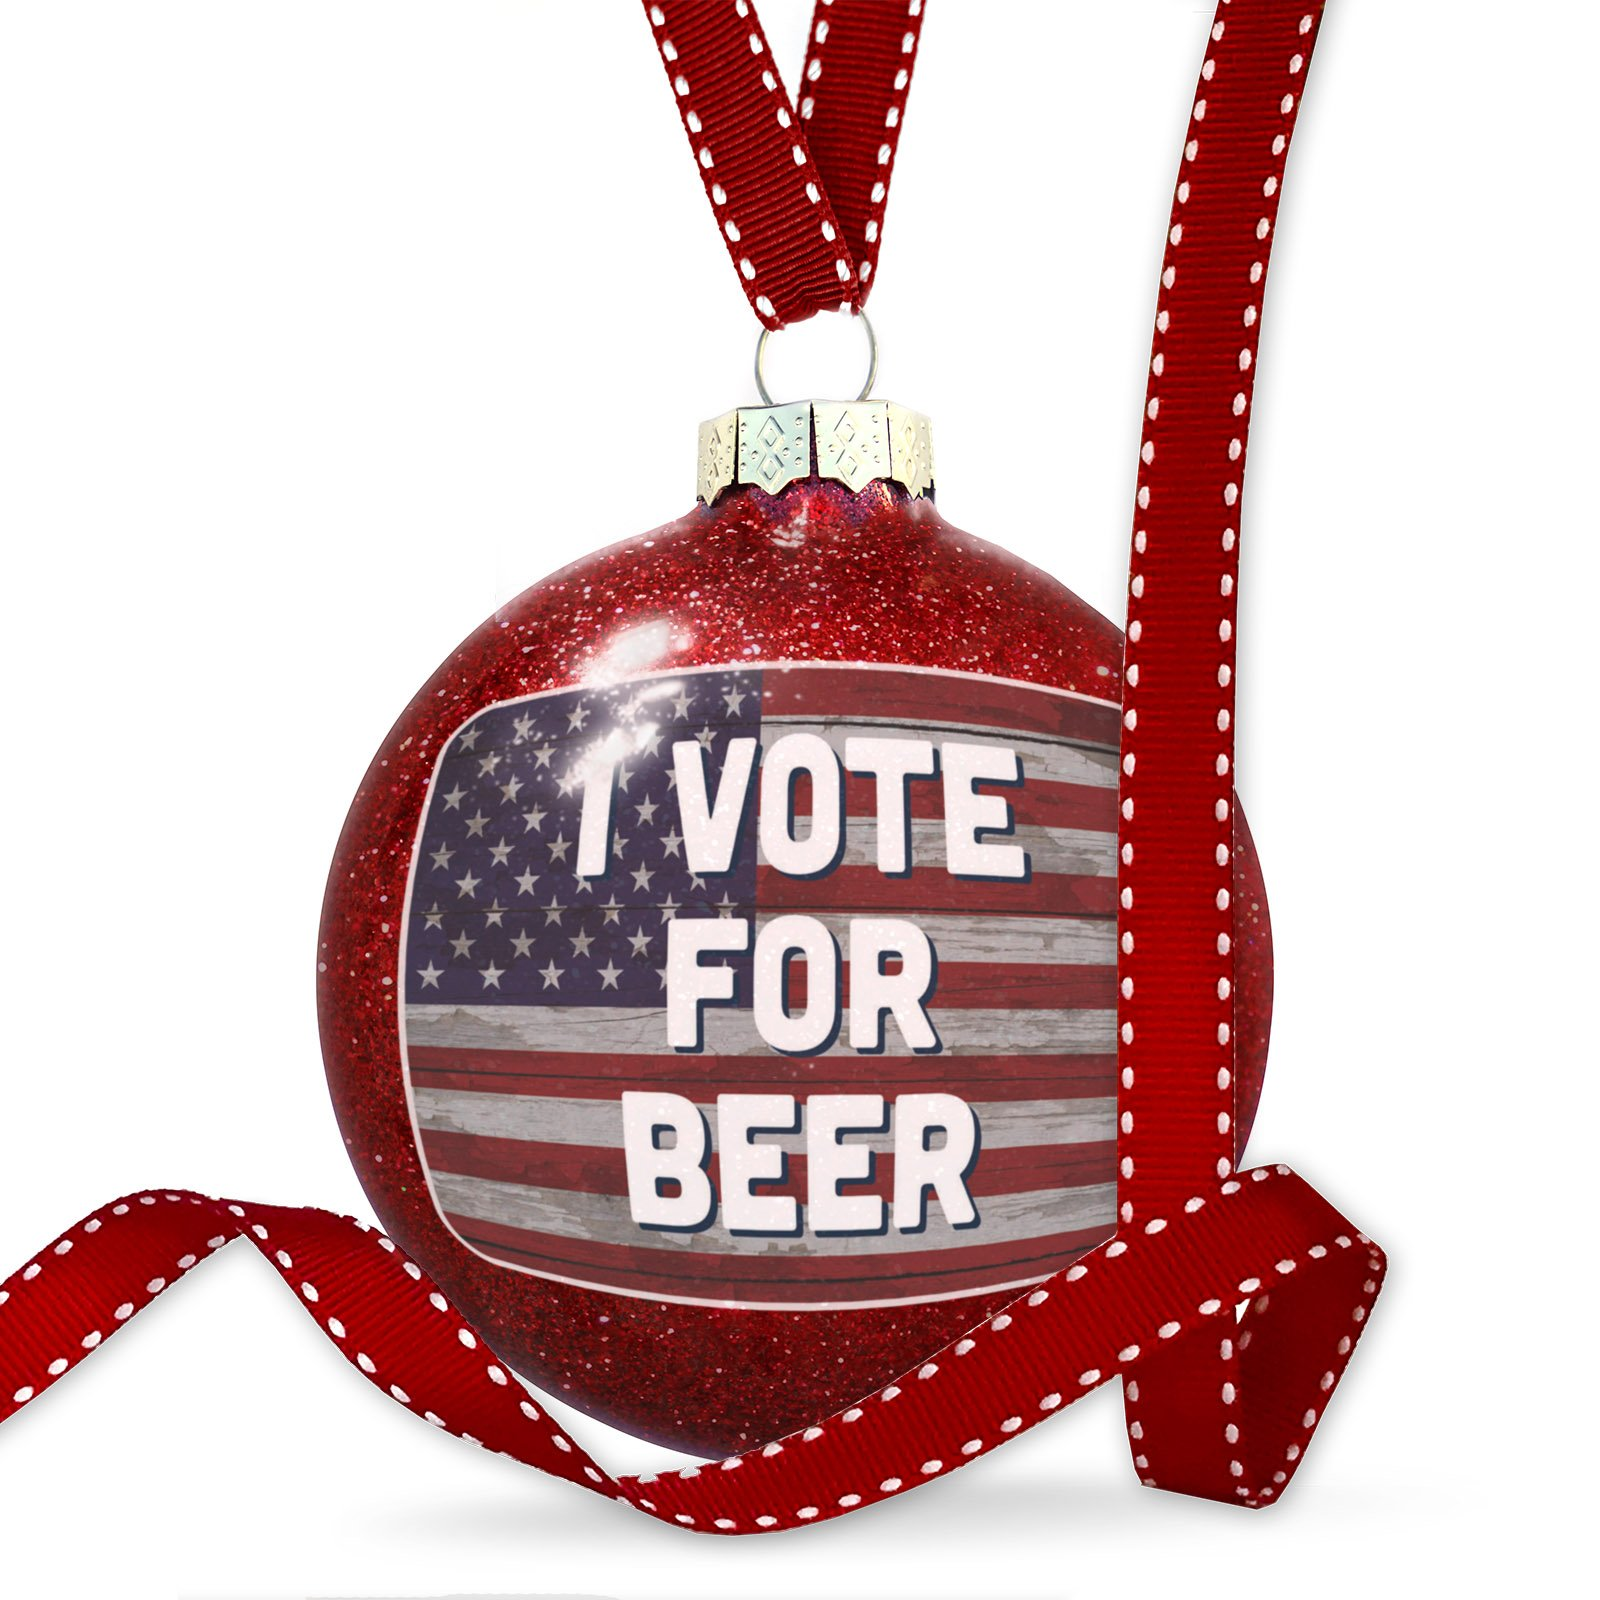 Christmas Decoration I Vote for Beer Fourth of July Vintage Wood Flag Ornament